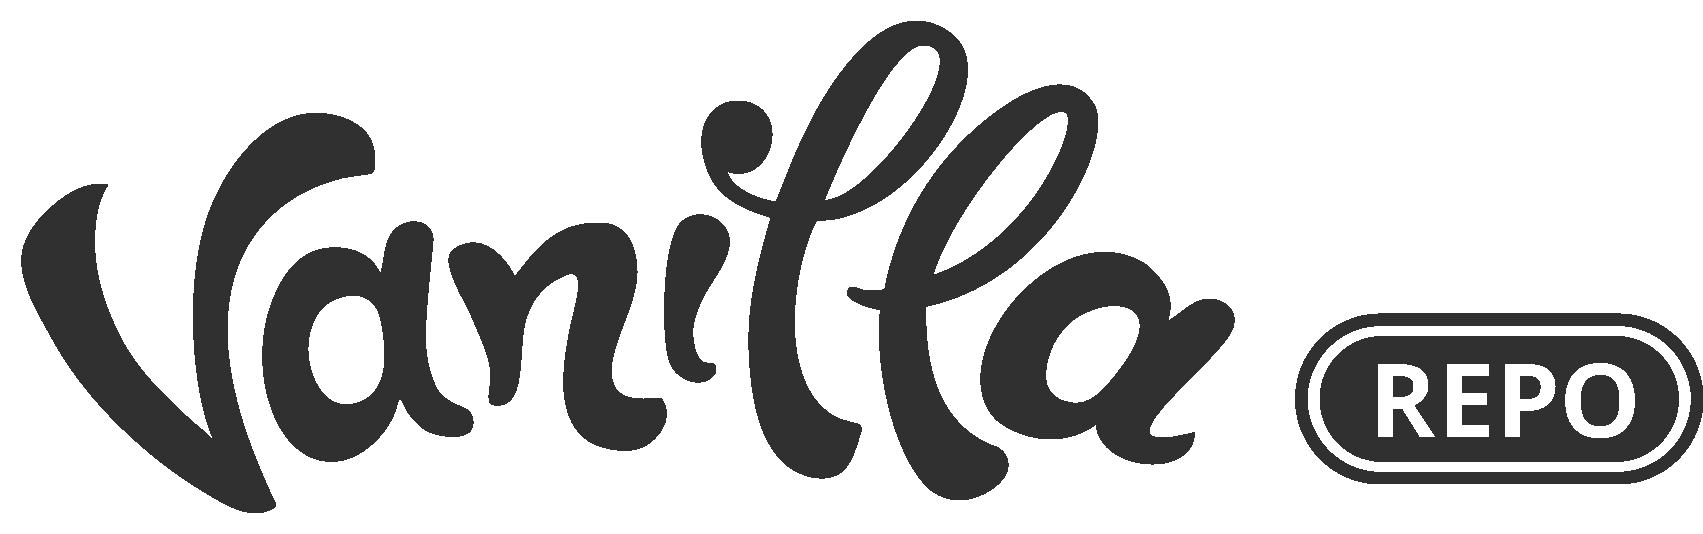 GitHub - vanilla/vanilla: Vanilla is a powerfully simple discussion